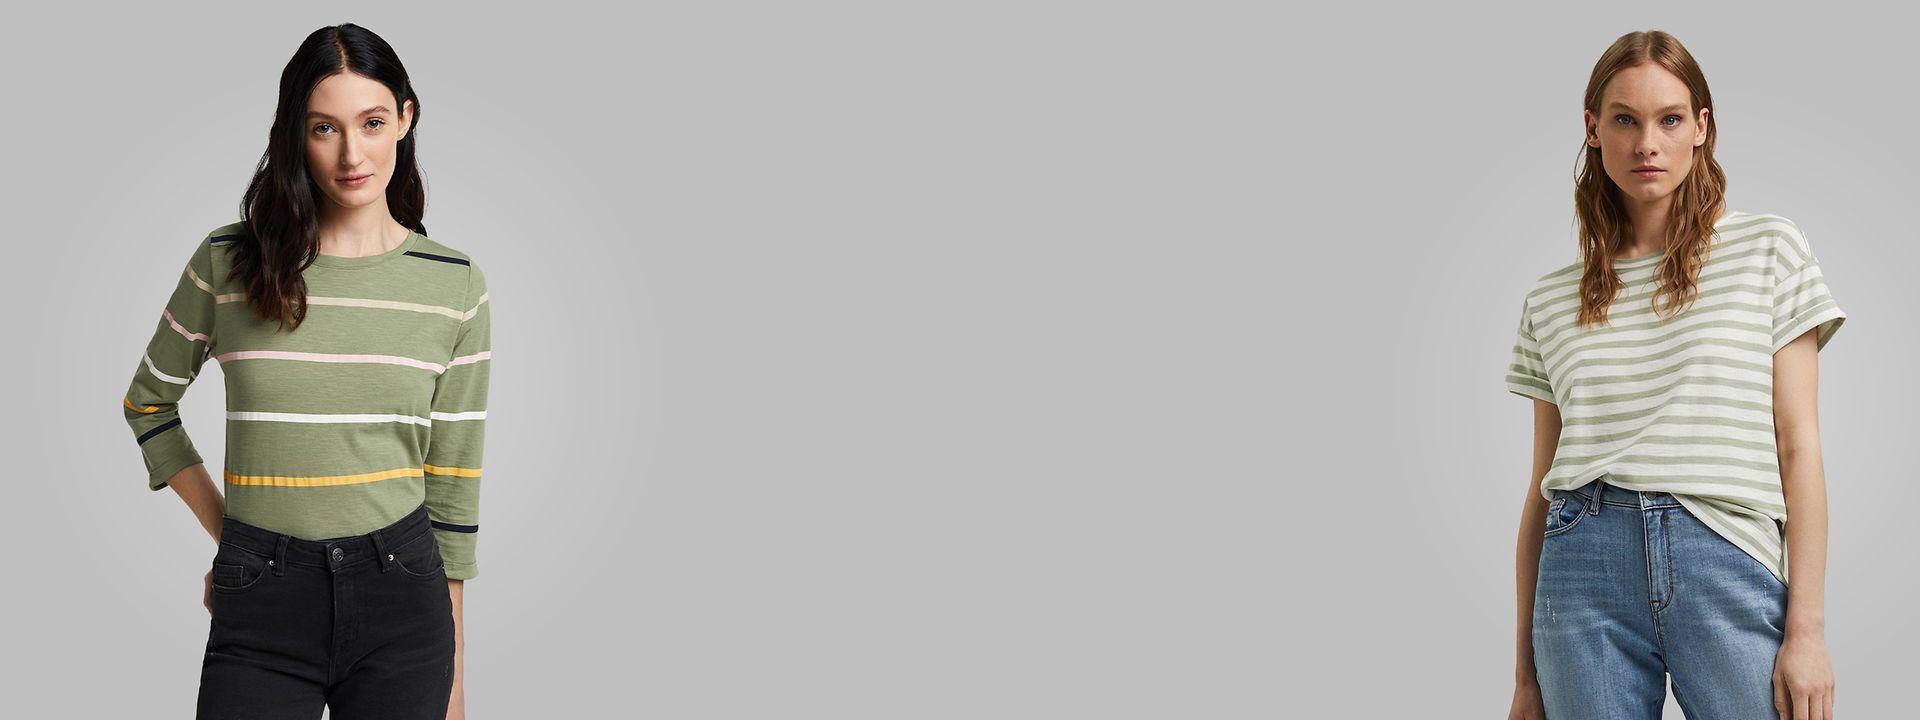 112021--gender---startpage--main-banner--topic---IMG1